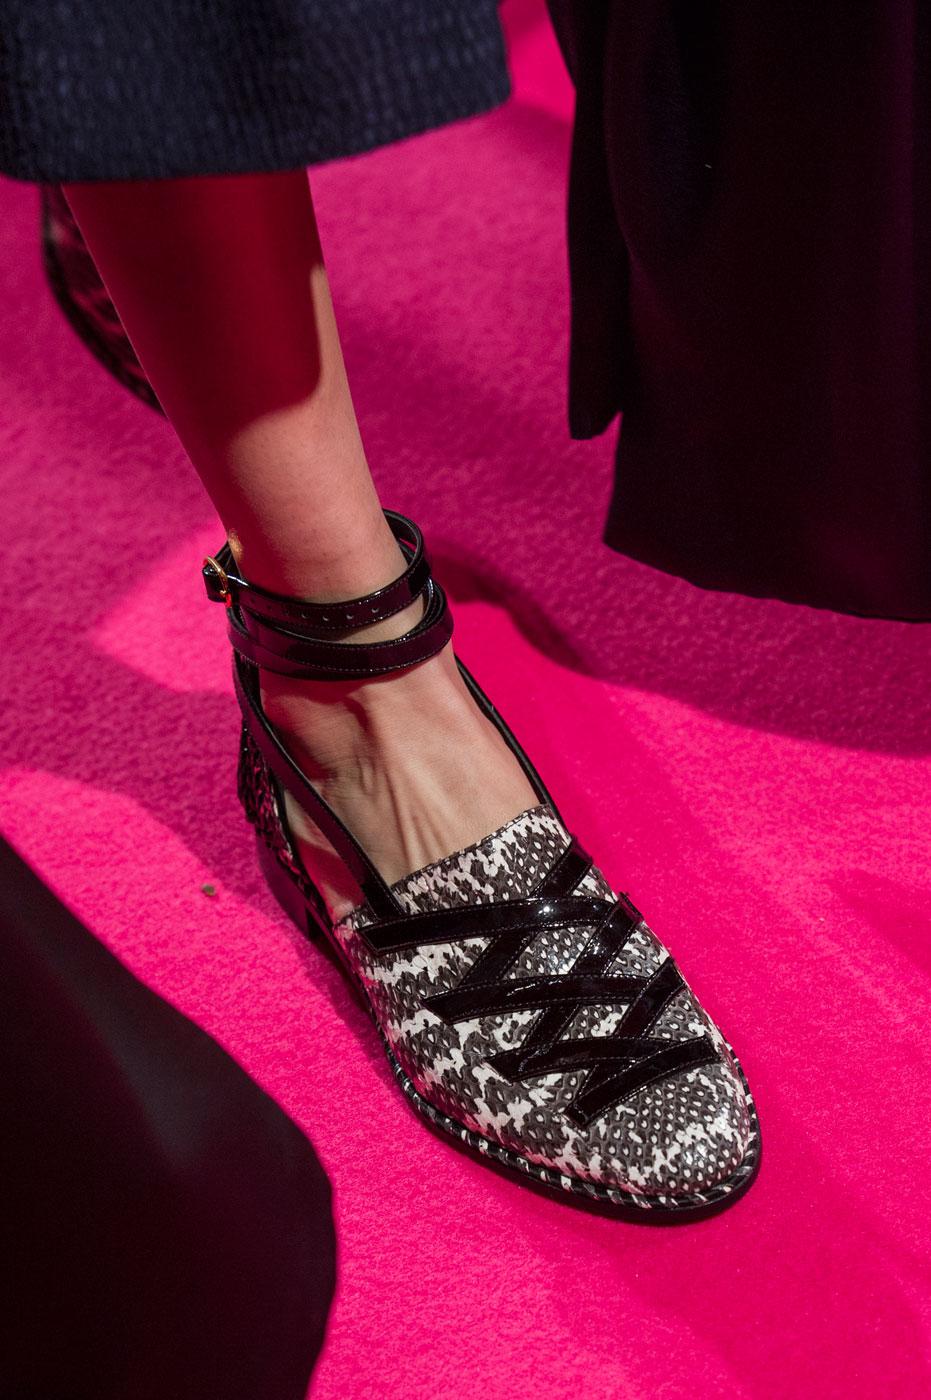 Schiaparelli-fashion-runway-show-close-ups-haute-couture-paris-spring-summer-2015-the-impression-59